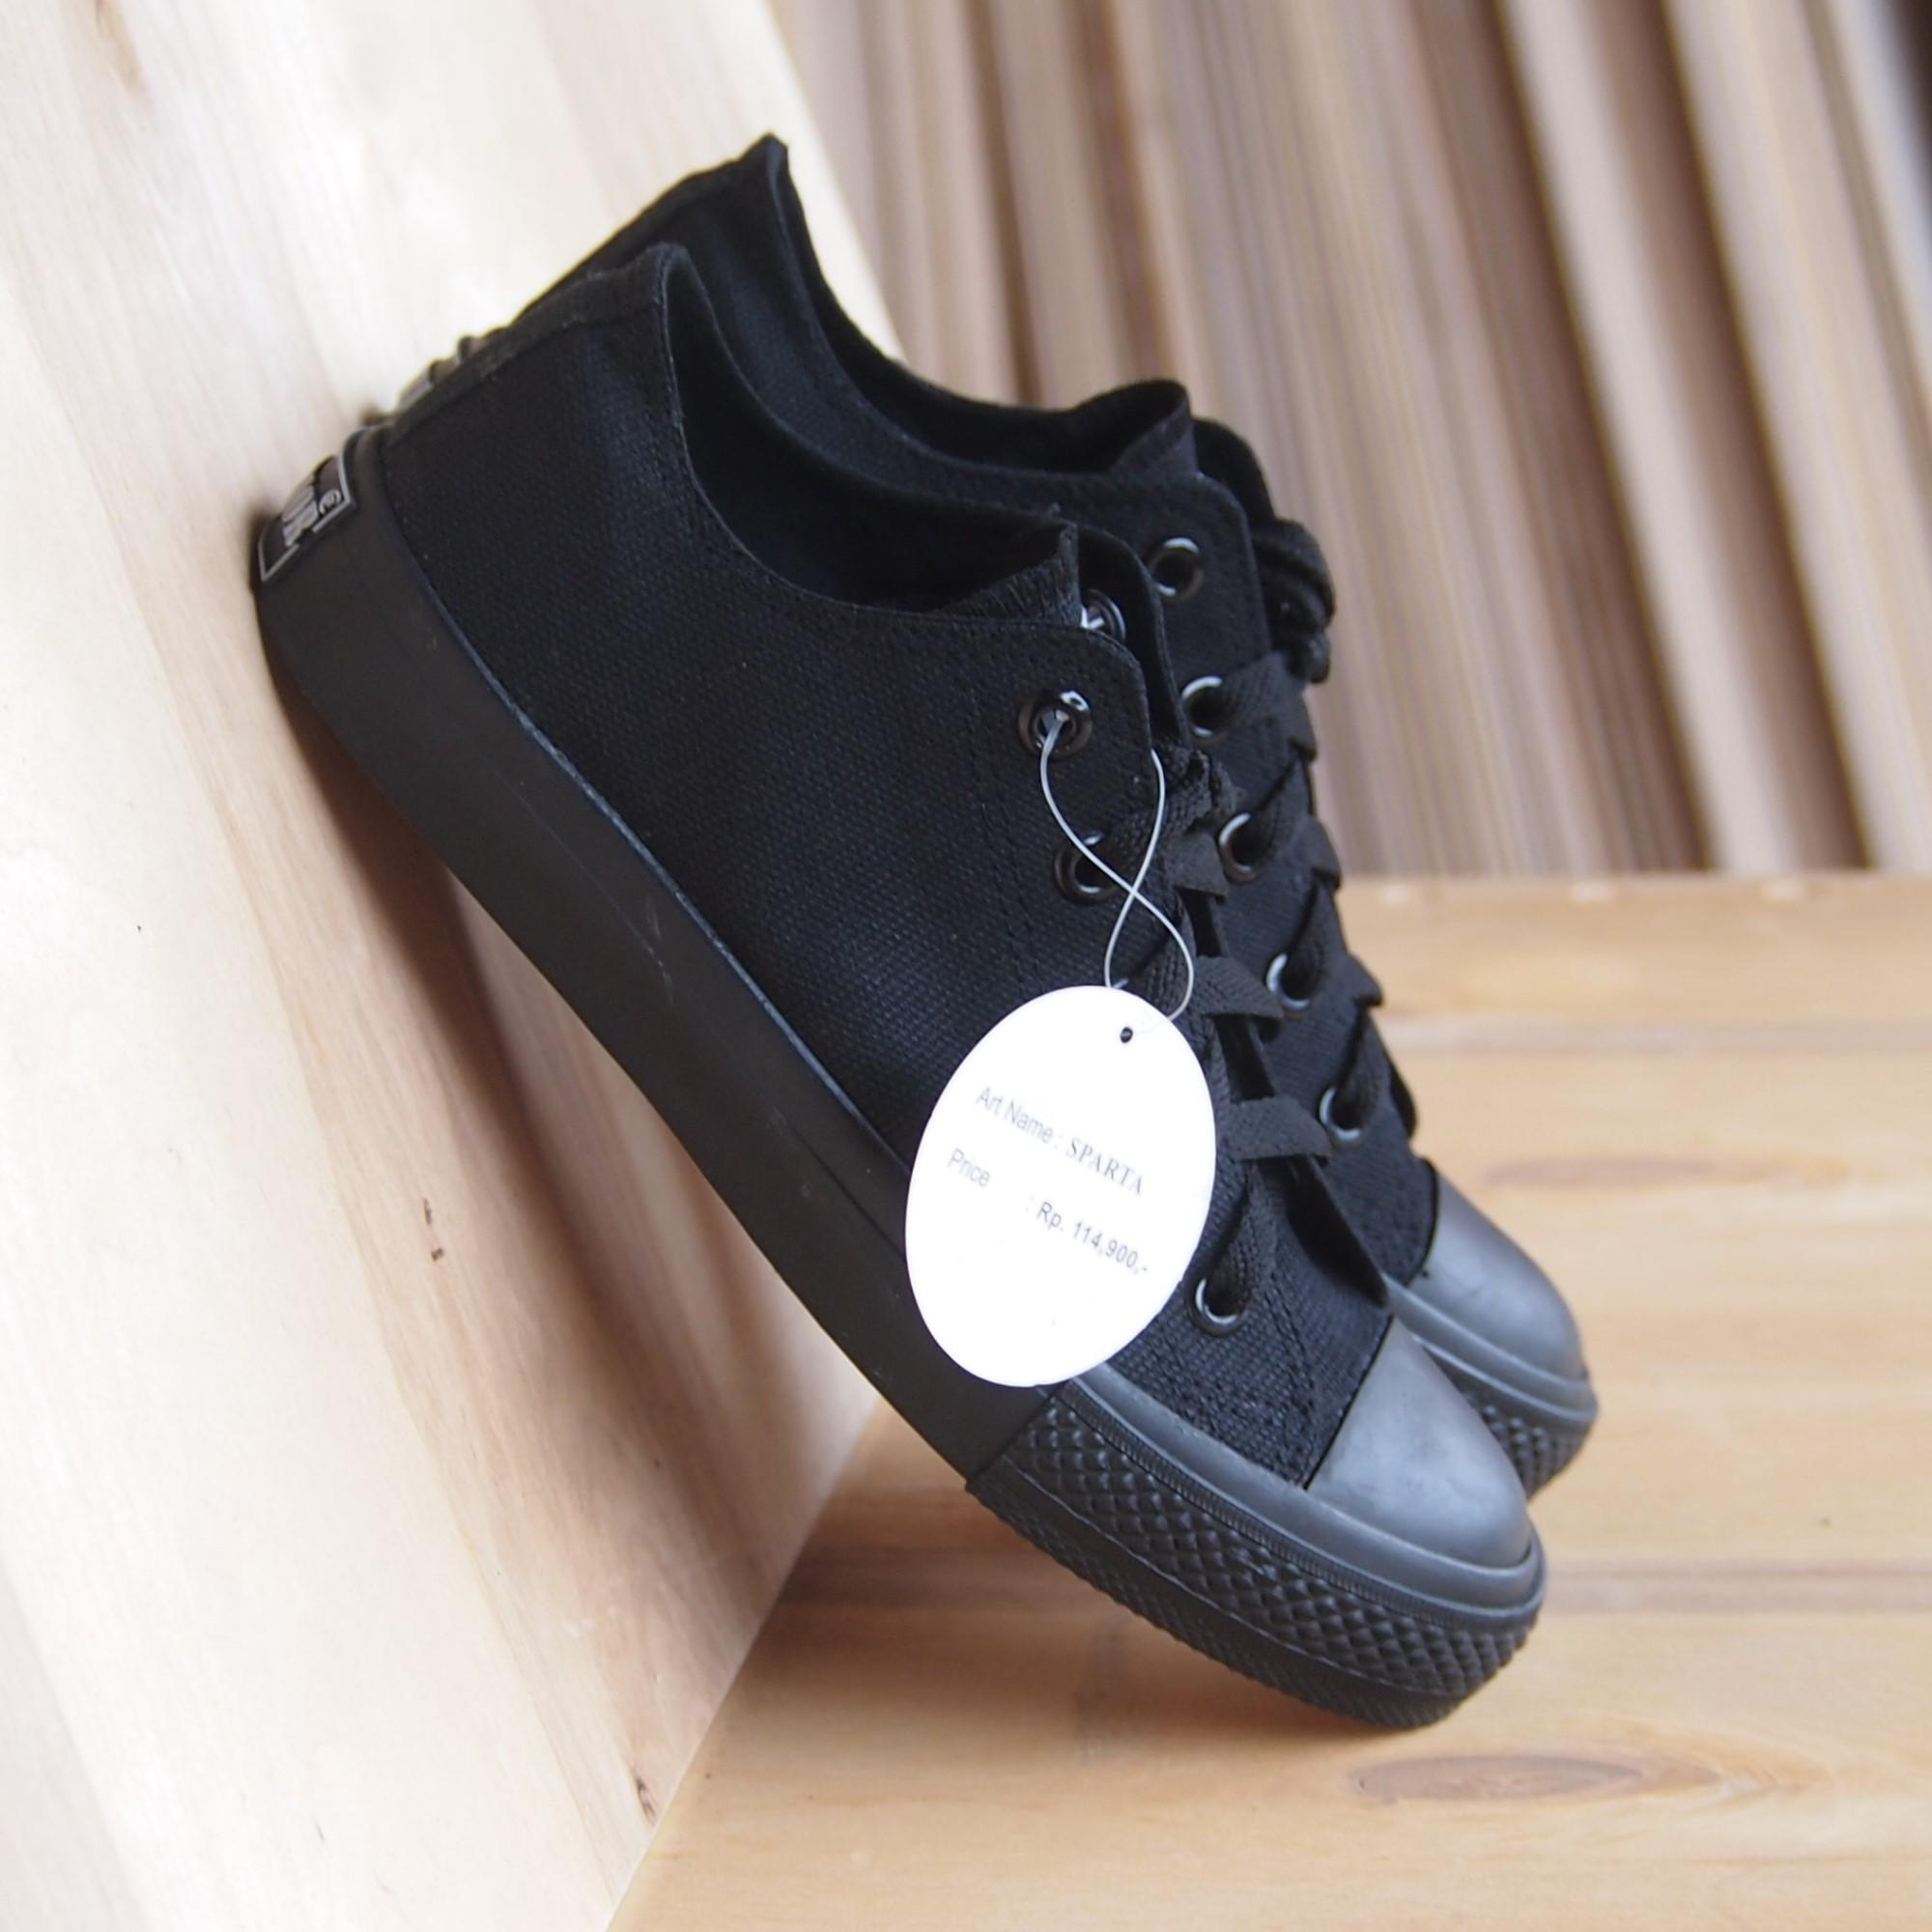 Sepatu Kets Warrior Cewek Cowok MD70 SPARTALC All Black